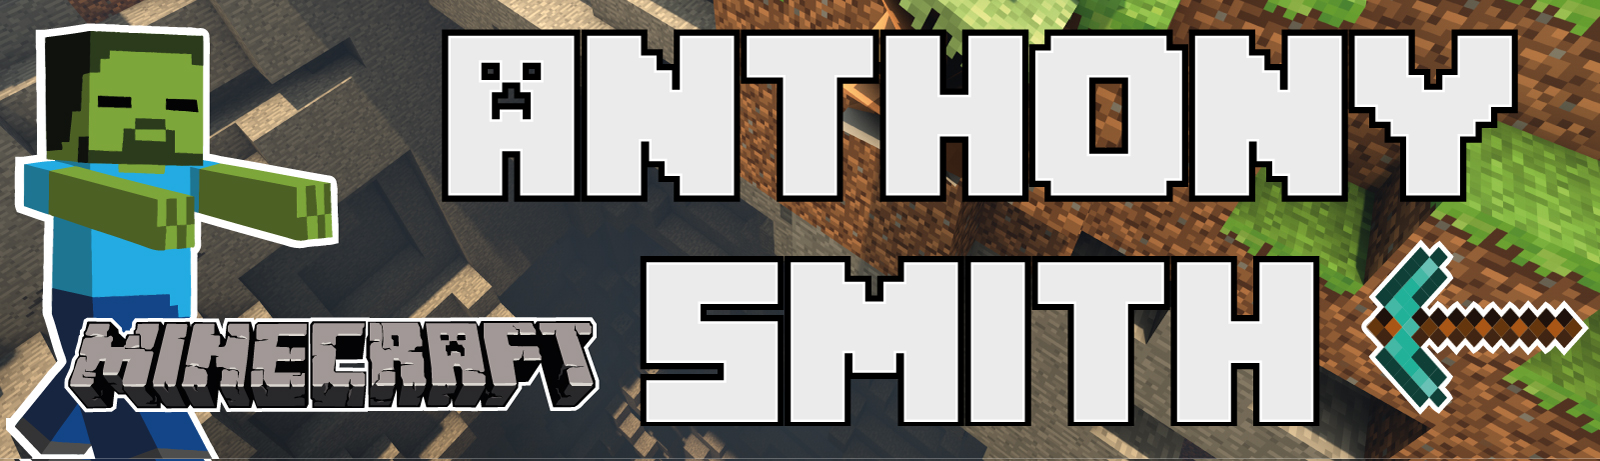 minecraft-school-label.jpg